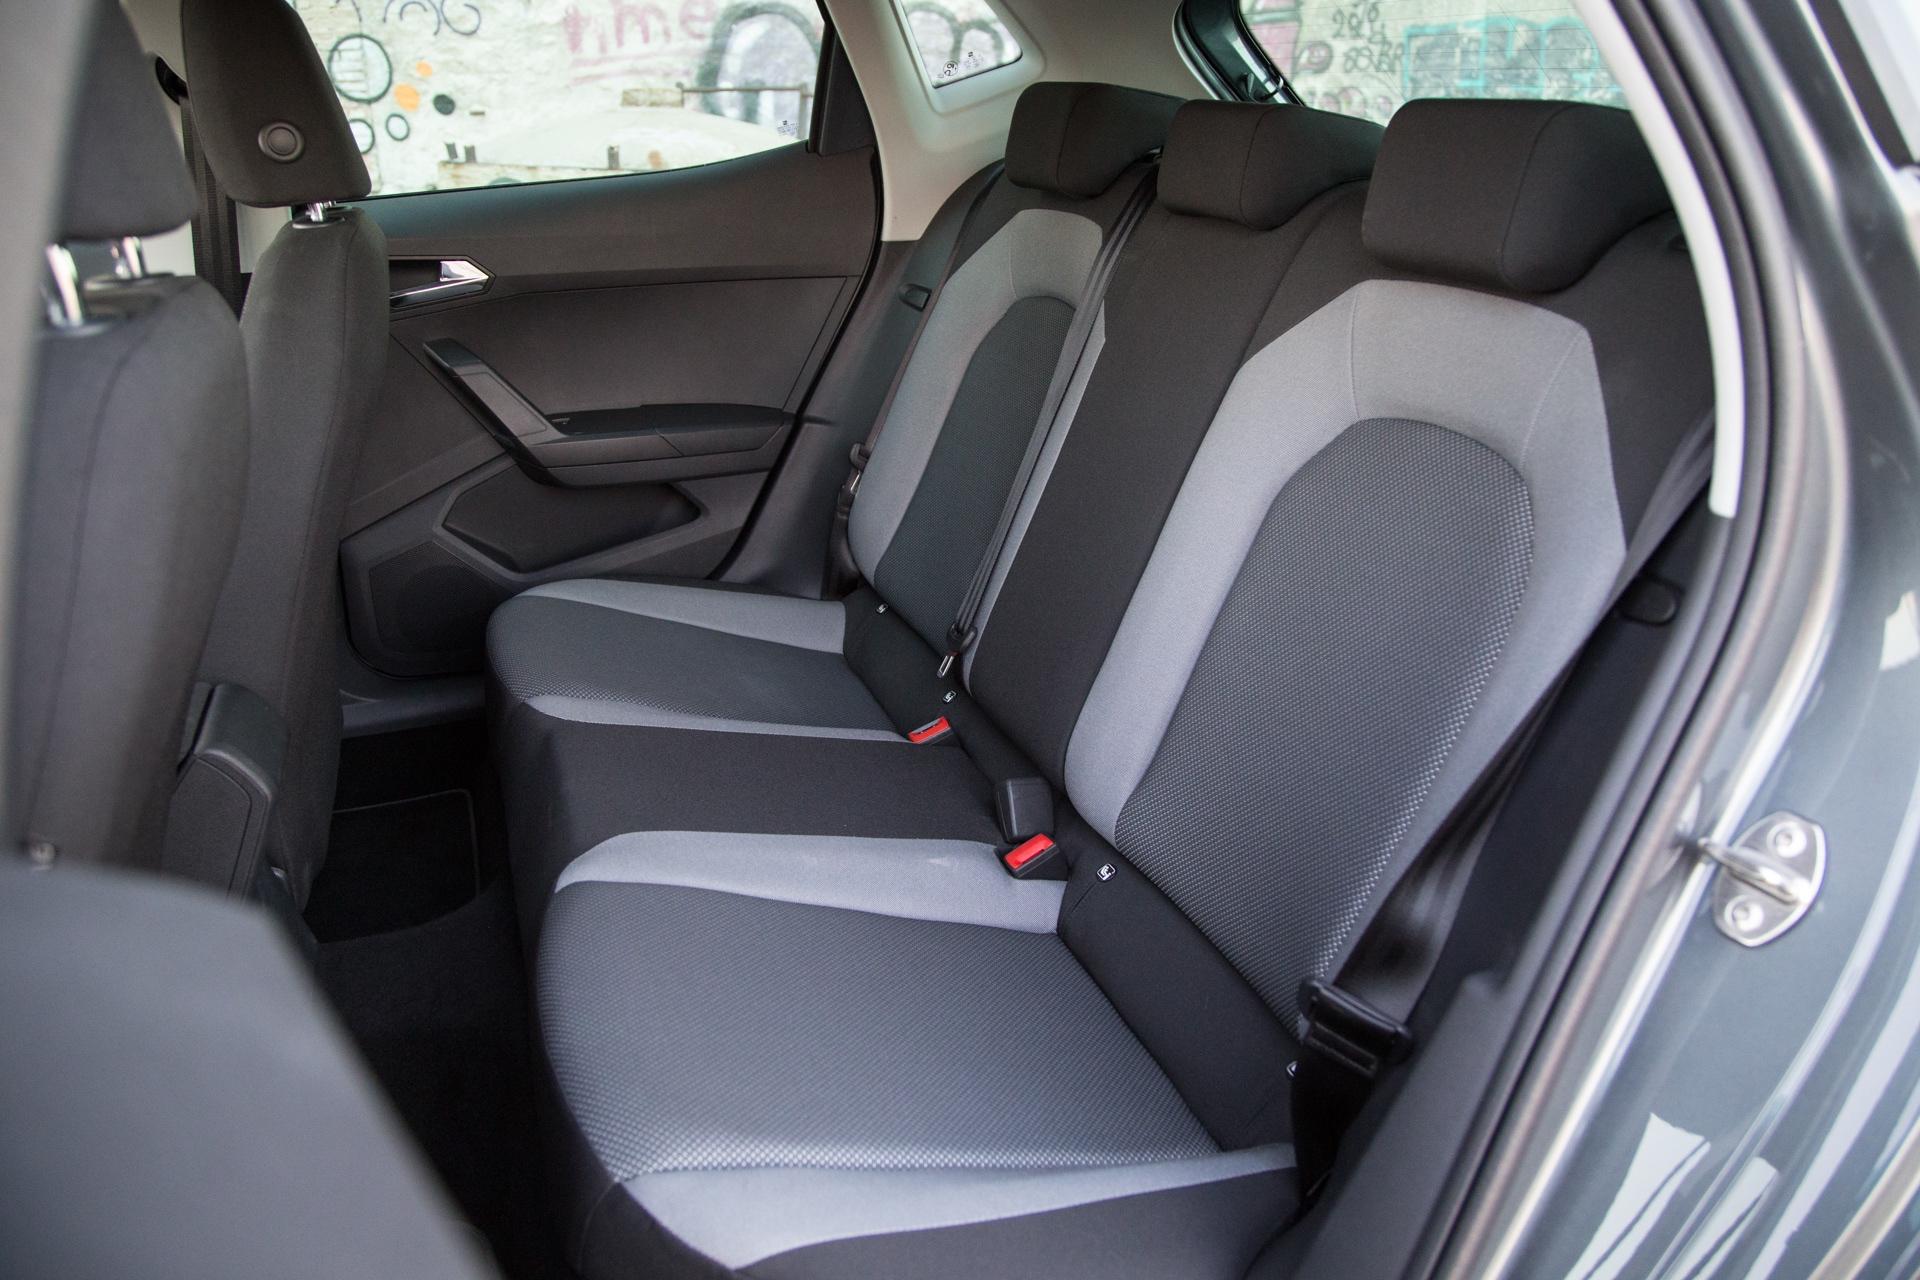 Test_Drive_Seat_Ibiza_1.0_21